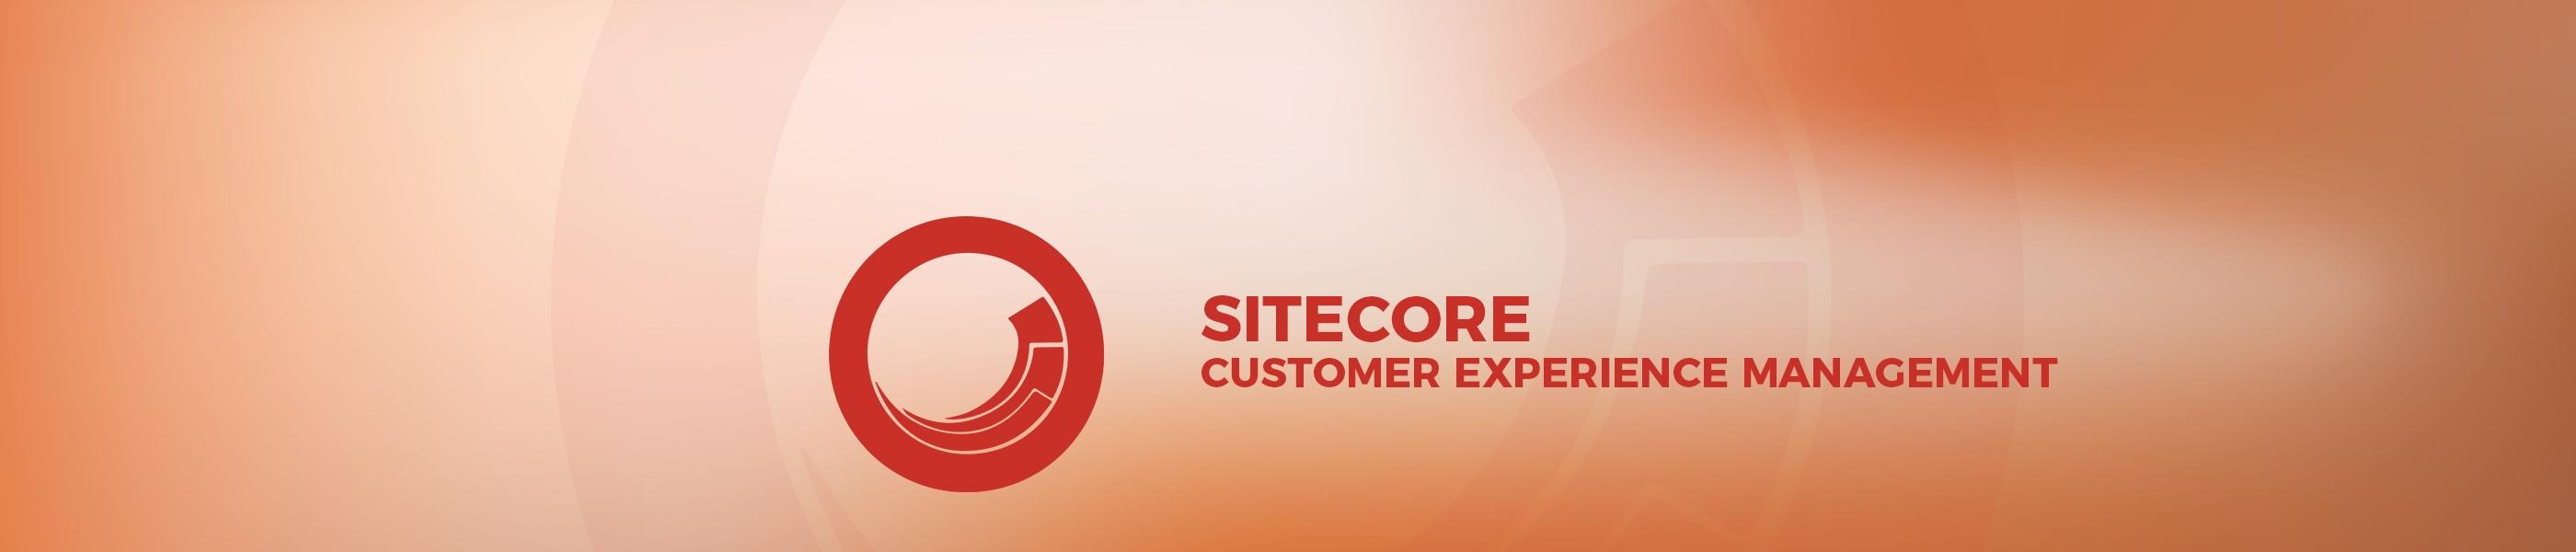 180108_Produkte-Sitecore.jpg